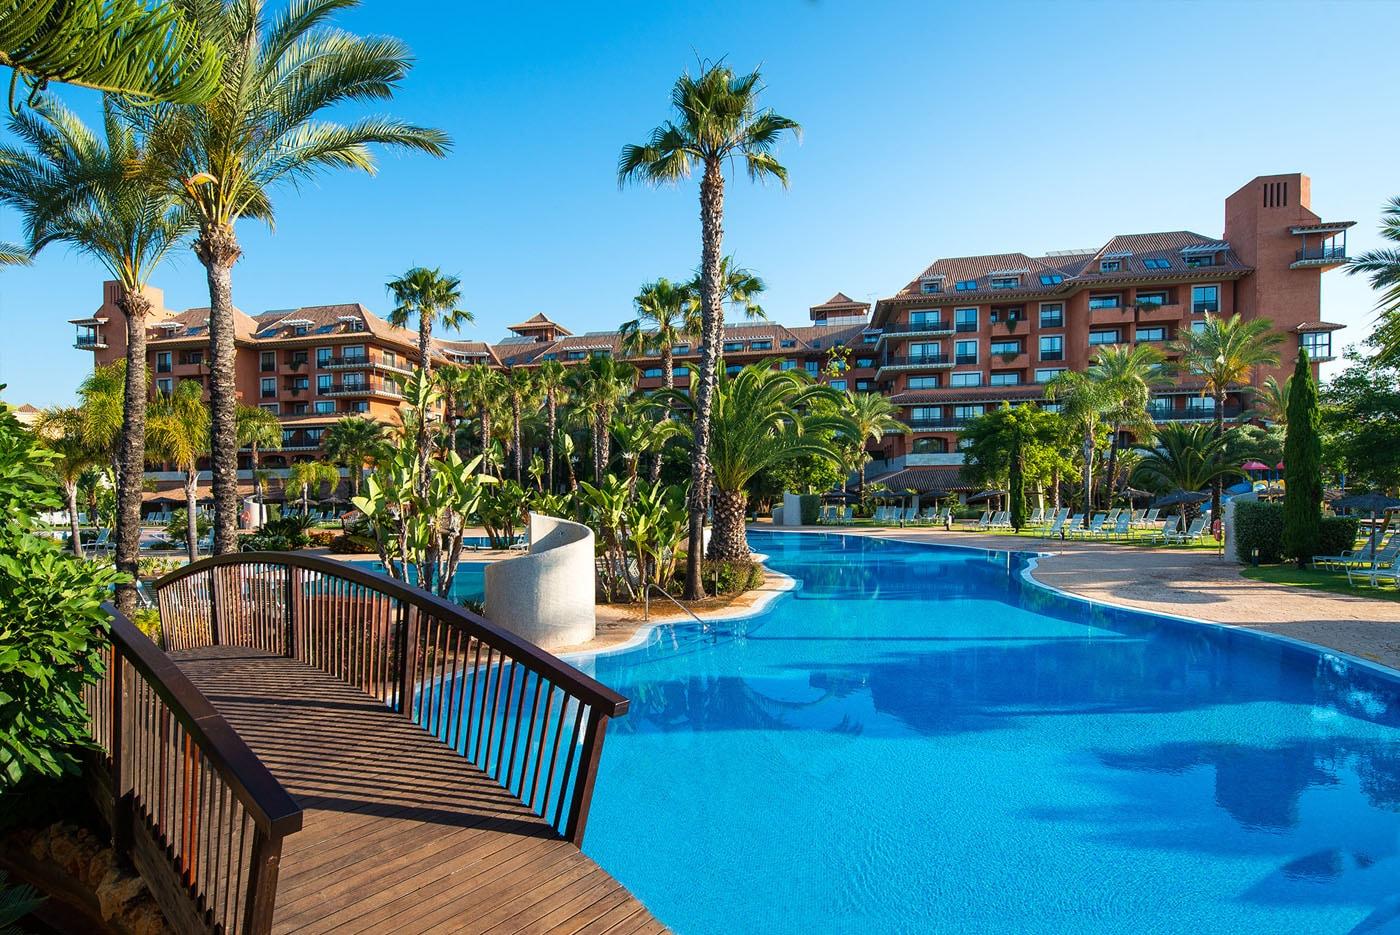 puerto-antilla-grand-hotel-adolfo-gosalvez-hoteles-panoramicos